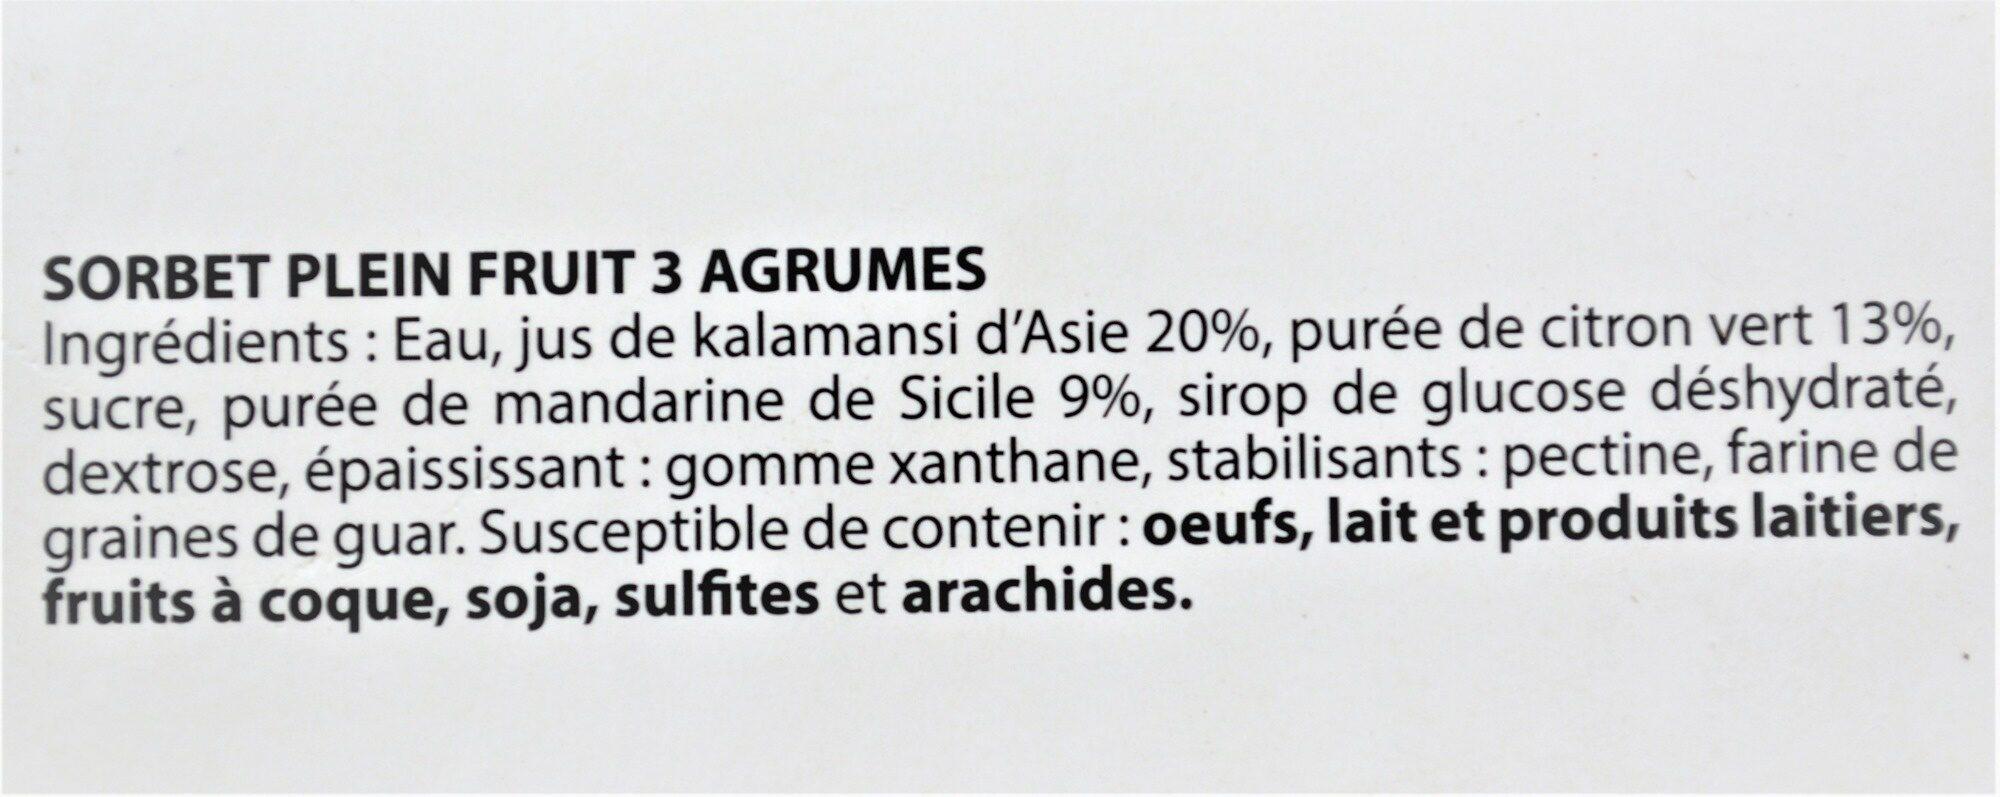 Sorbet plein fruit 3 AGRUMES, 42% de fruit - Ingredients